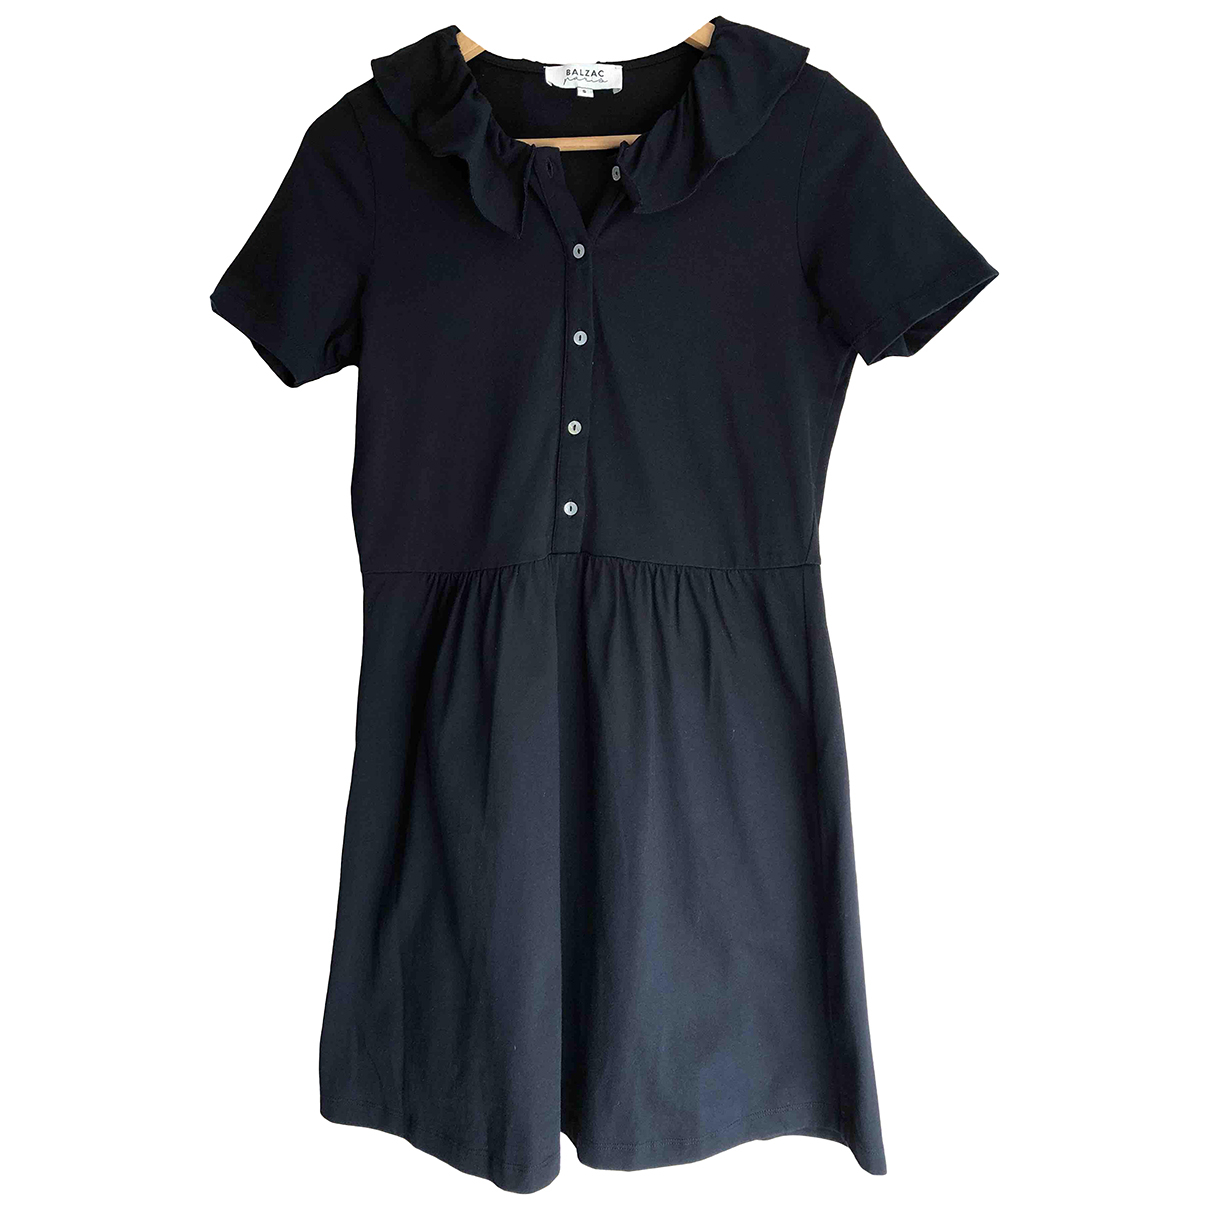 Balzac Paris \N Kleid in  Schwarz Baumwolle